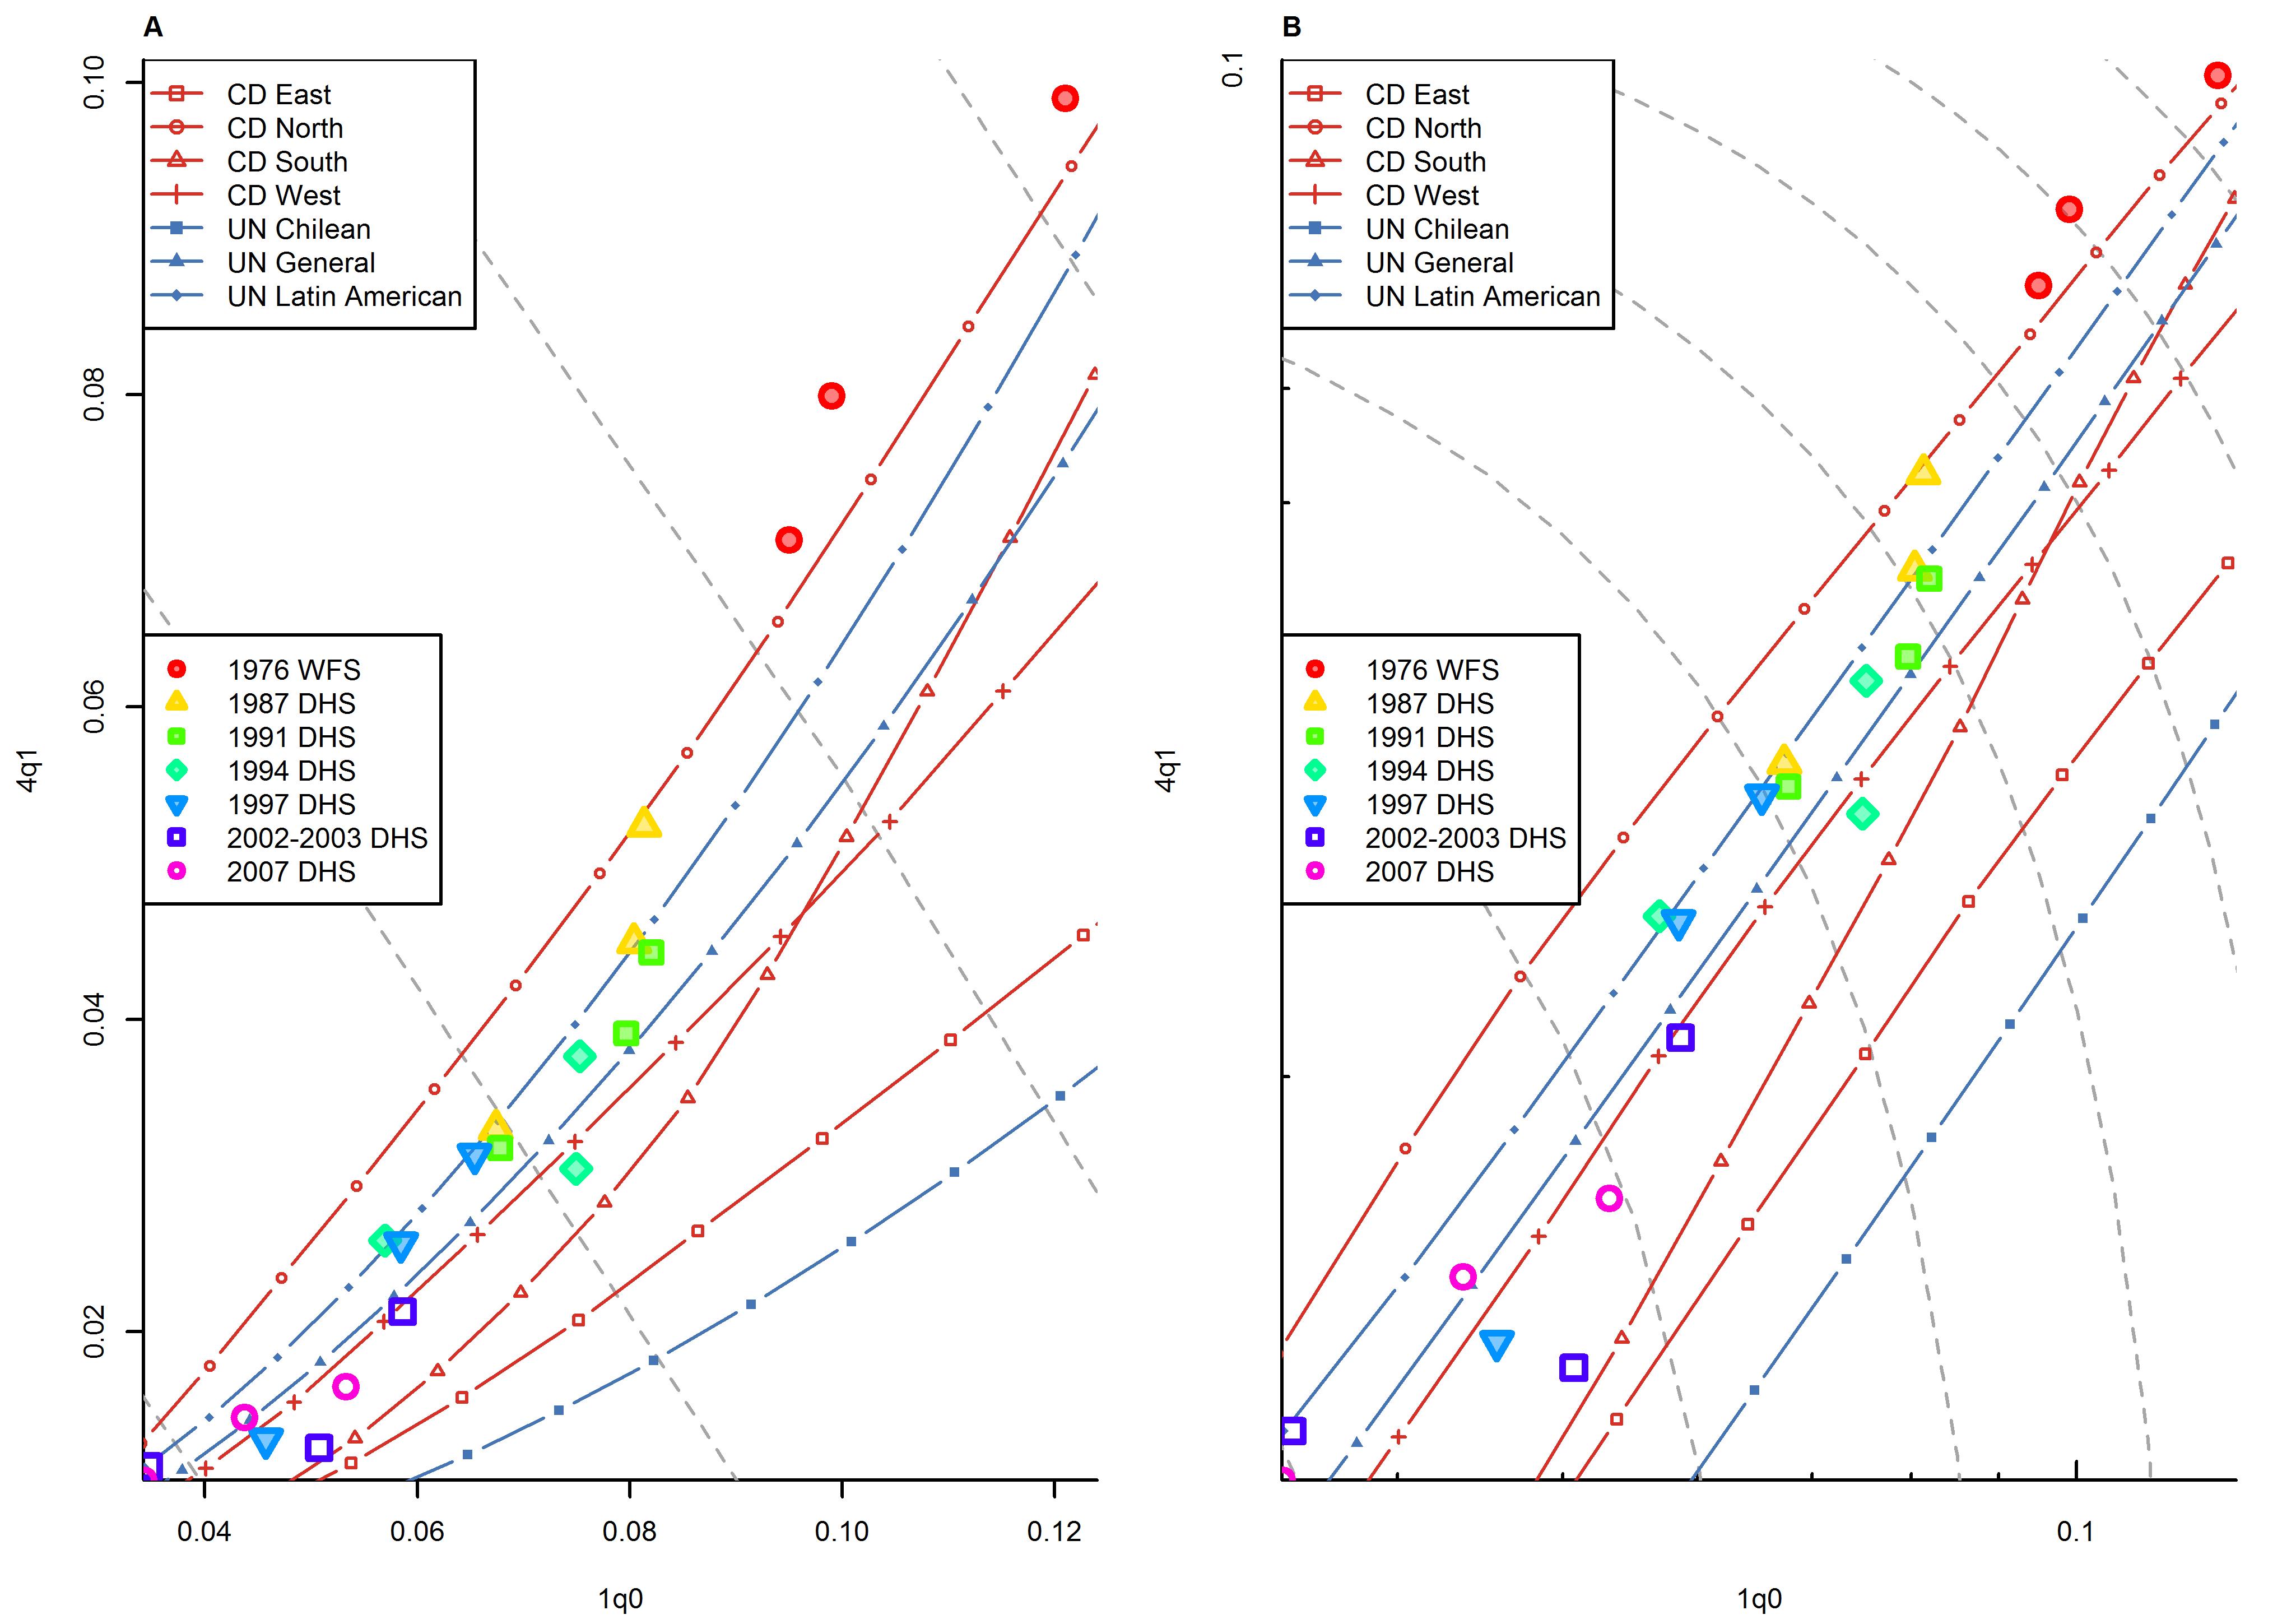 Relationship between <sub>1</sub><i>q</i><sub>0</sub> and <sub>4</sub><i>q</i><sub>1</sub> in Indonesia (WFS and DHS data).